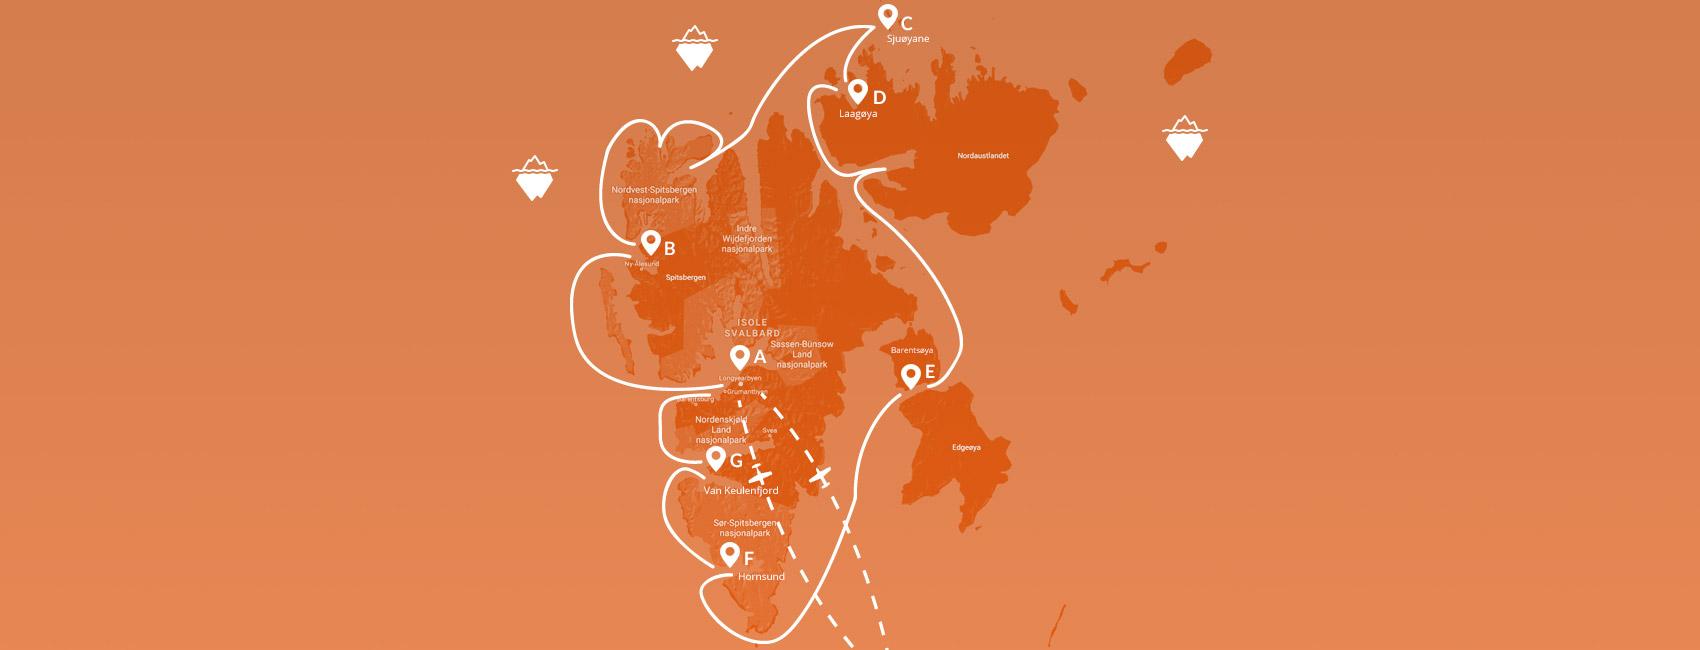 maps-isole-svalbard-stella-polare